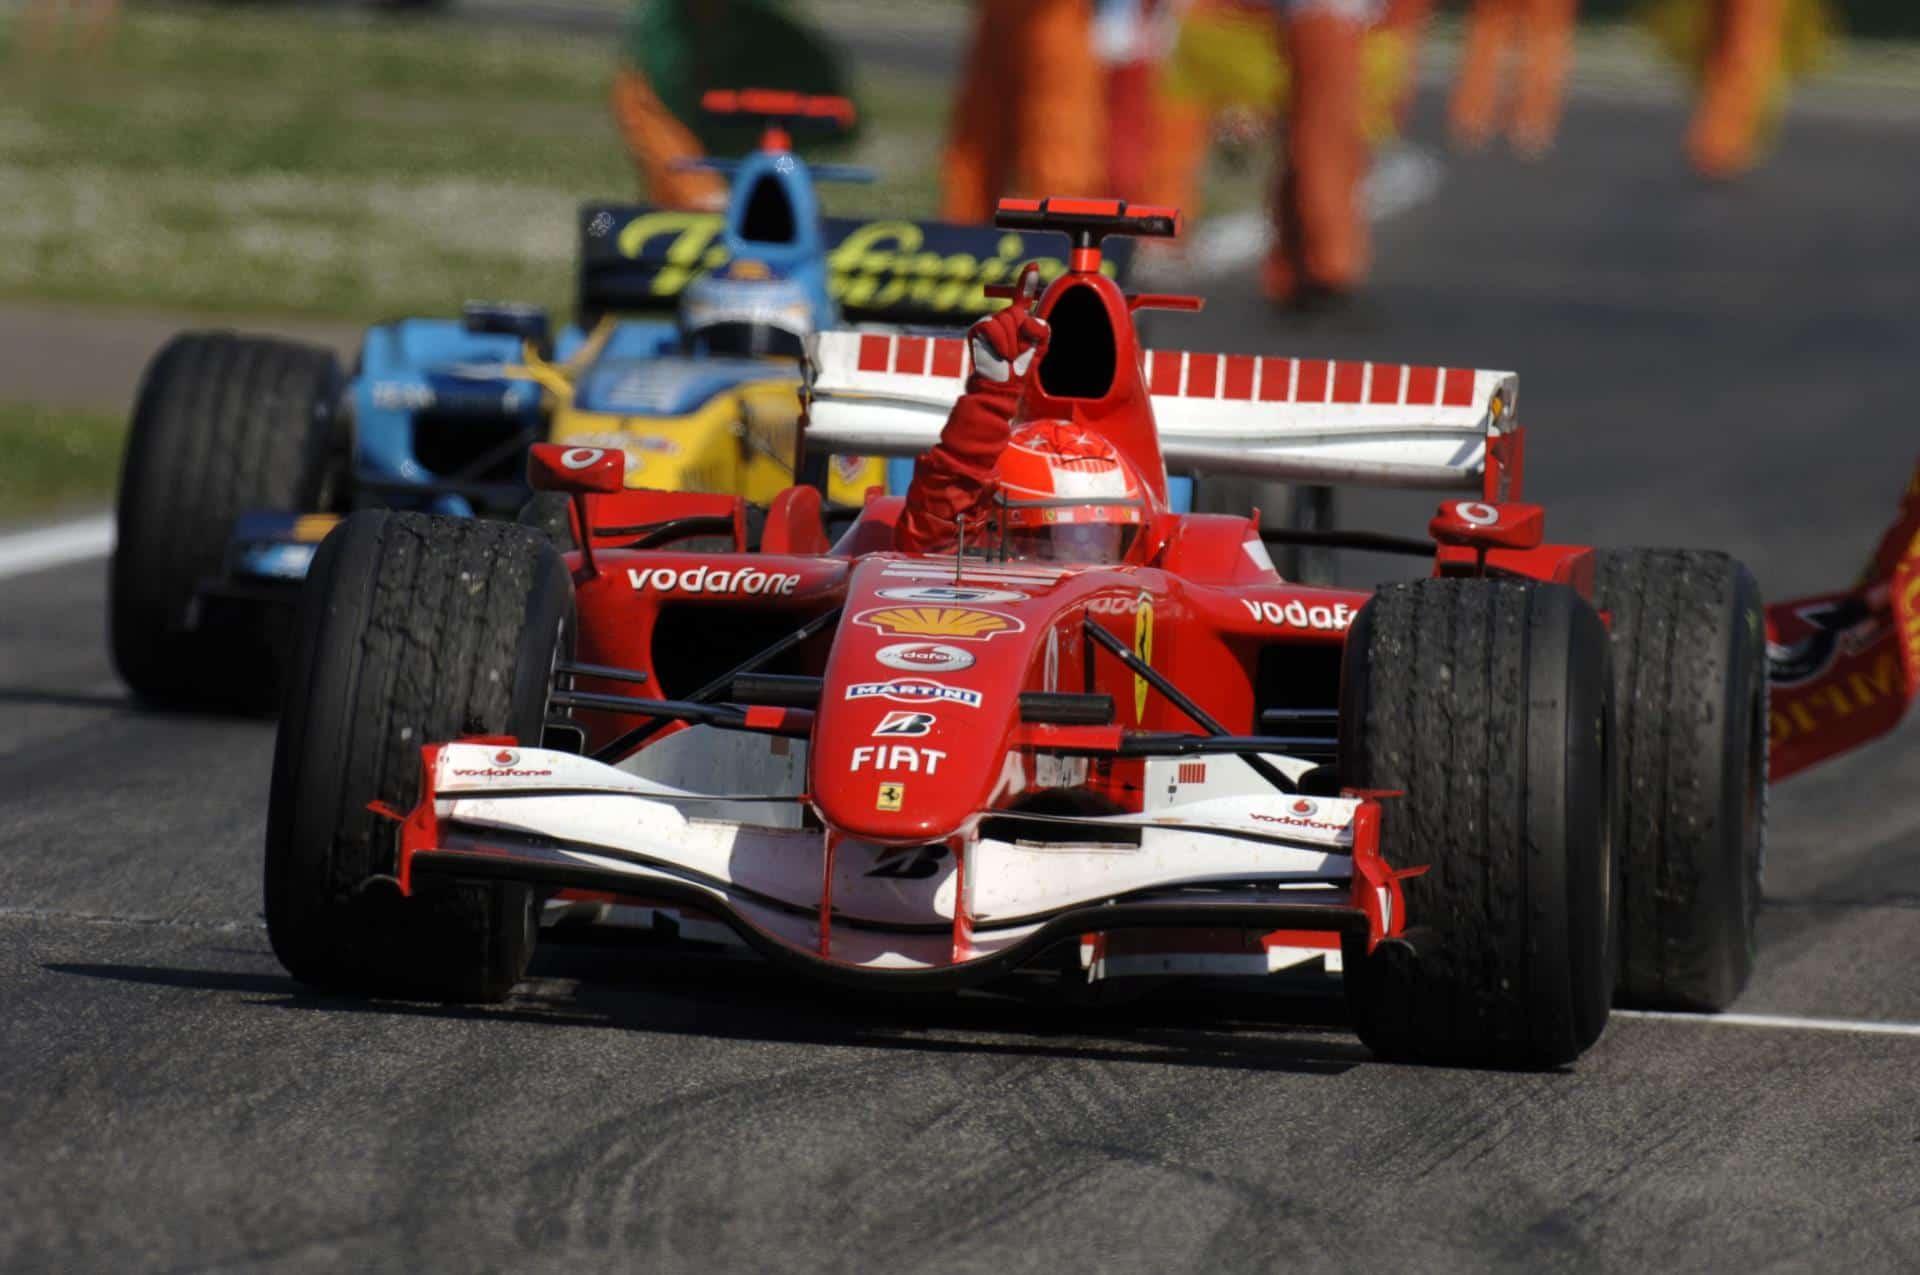 Schumacher celebrates victory San Marino F1 2006 Imola Foto Ferrari